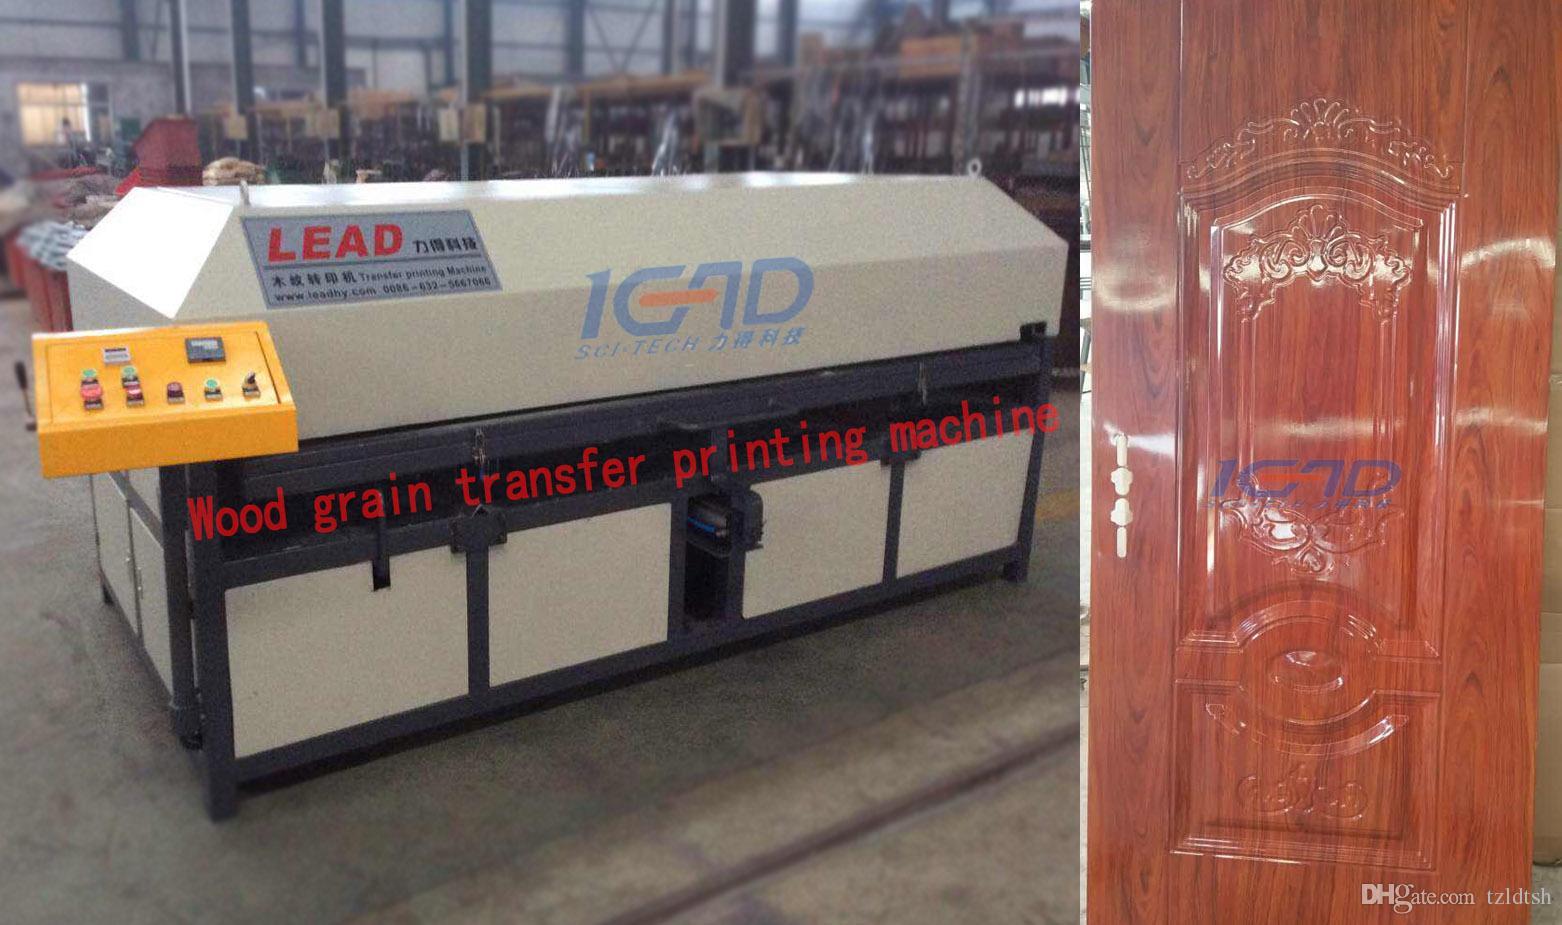 Wood Grain Transfer Machine The Whole Door Wood Grain Transfer Printing Machine Wood Grain Transfer Printing Machine Wood Grain Transfer Press for Metal ... & Wood Grain Transfer Machine The Whole Door Wood Grain Transfer ...